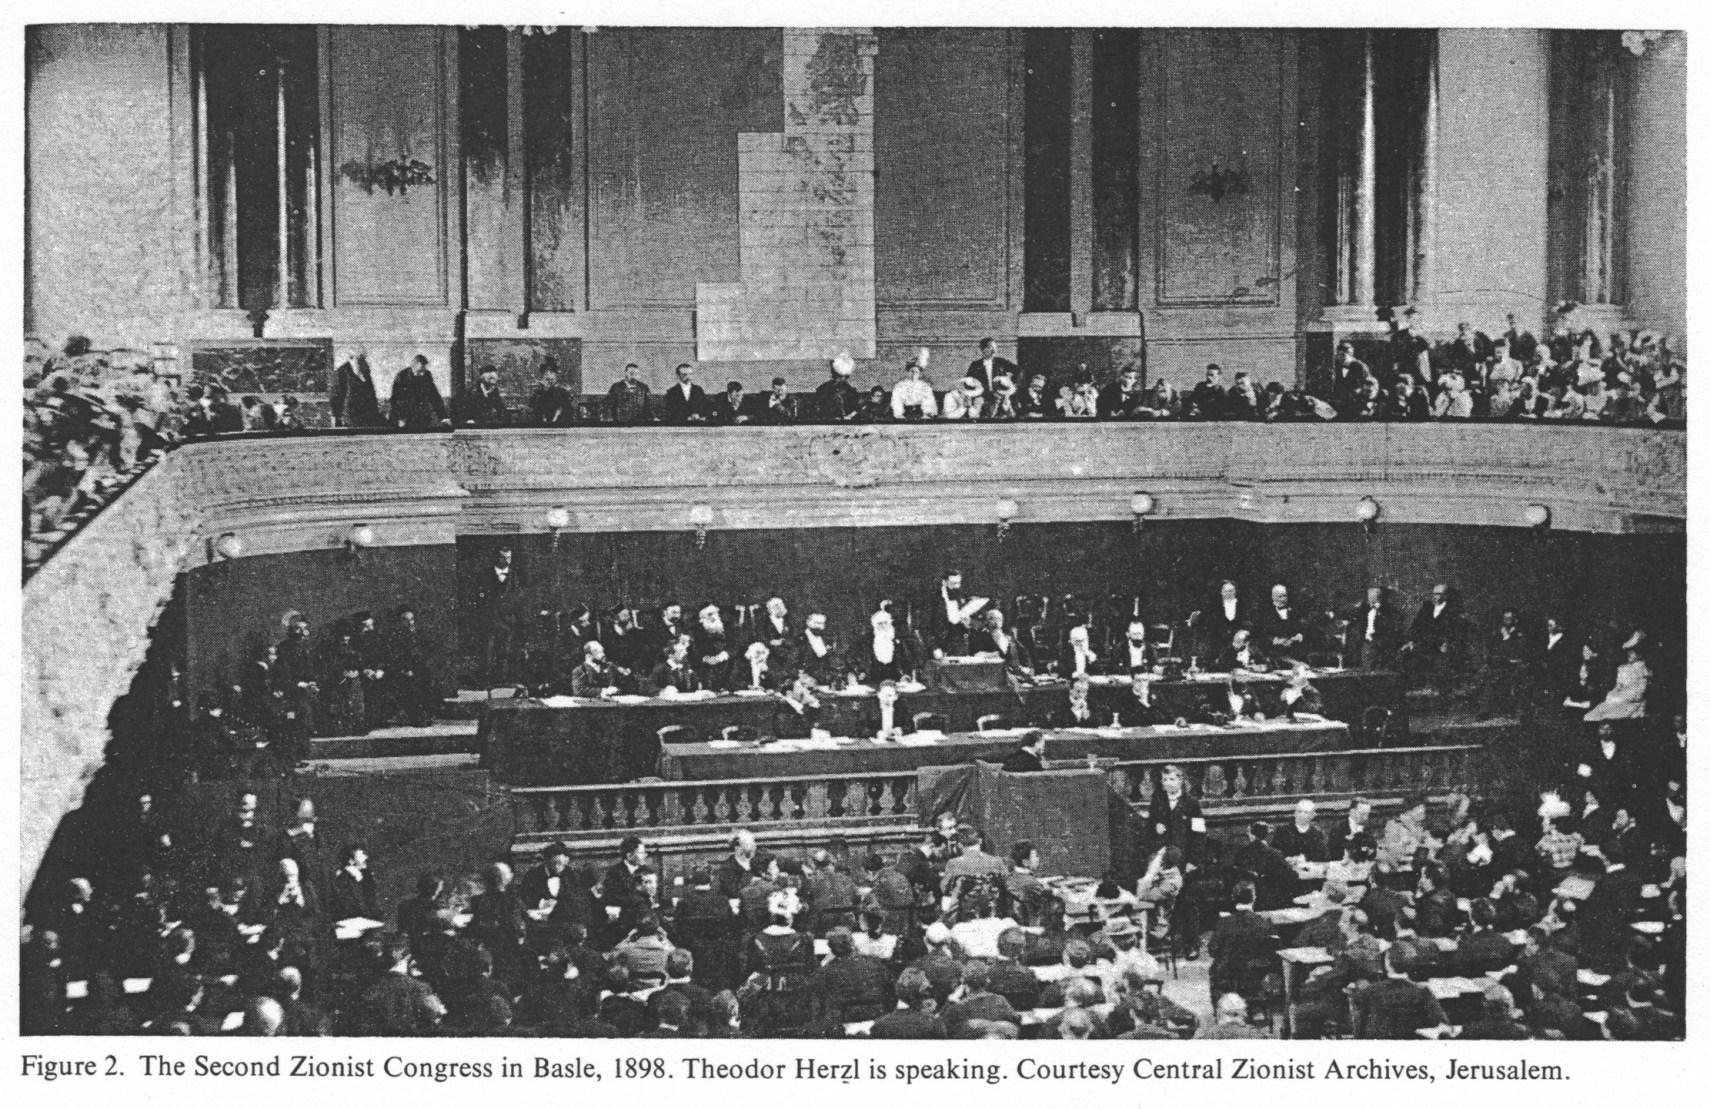 EncJud zionist congresses bd16 kol 1169 1170 rede rassist Herzl Basel 1898 - 3.Dünya Savaşı Ne Zaman Başlayacak?